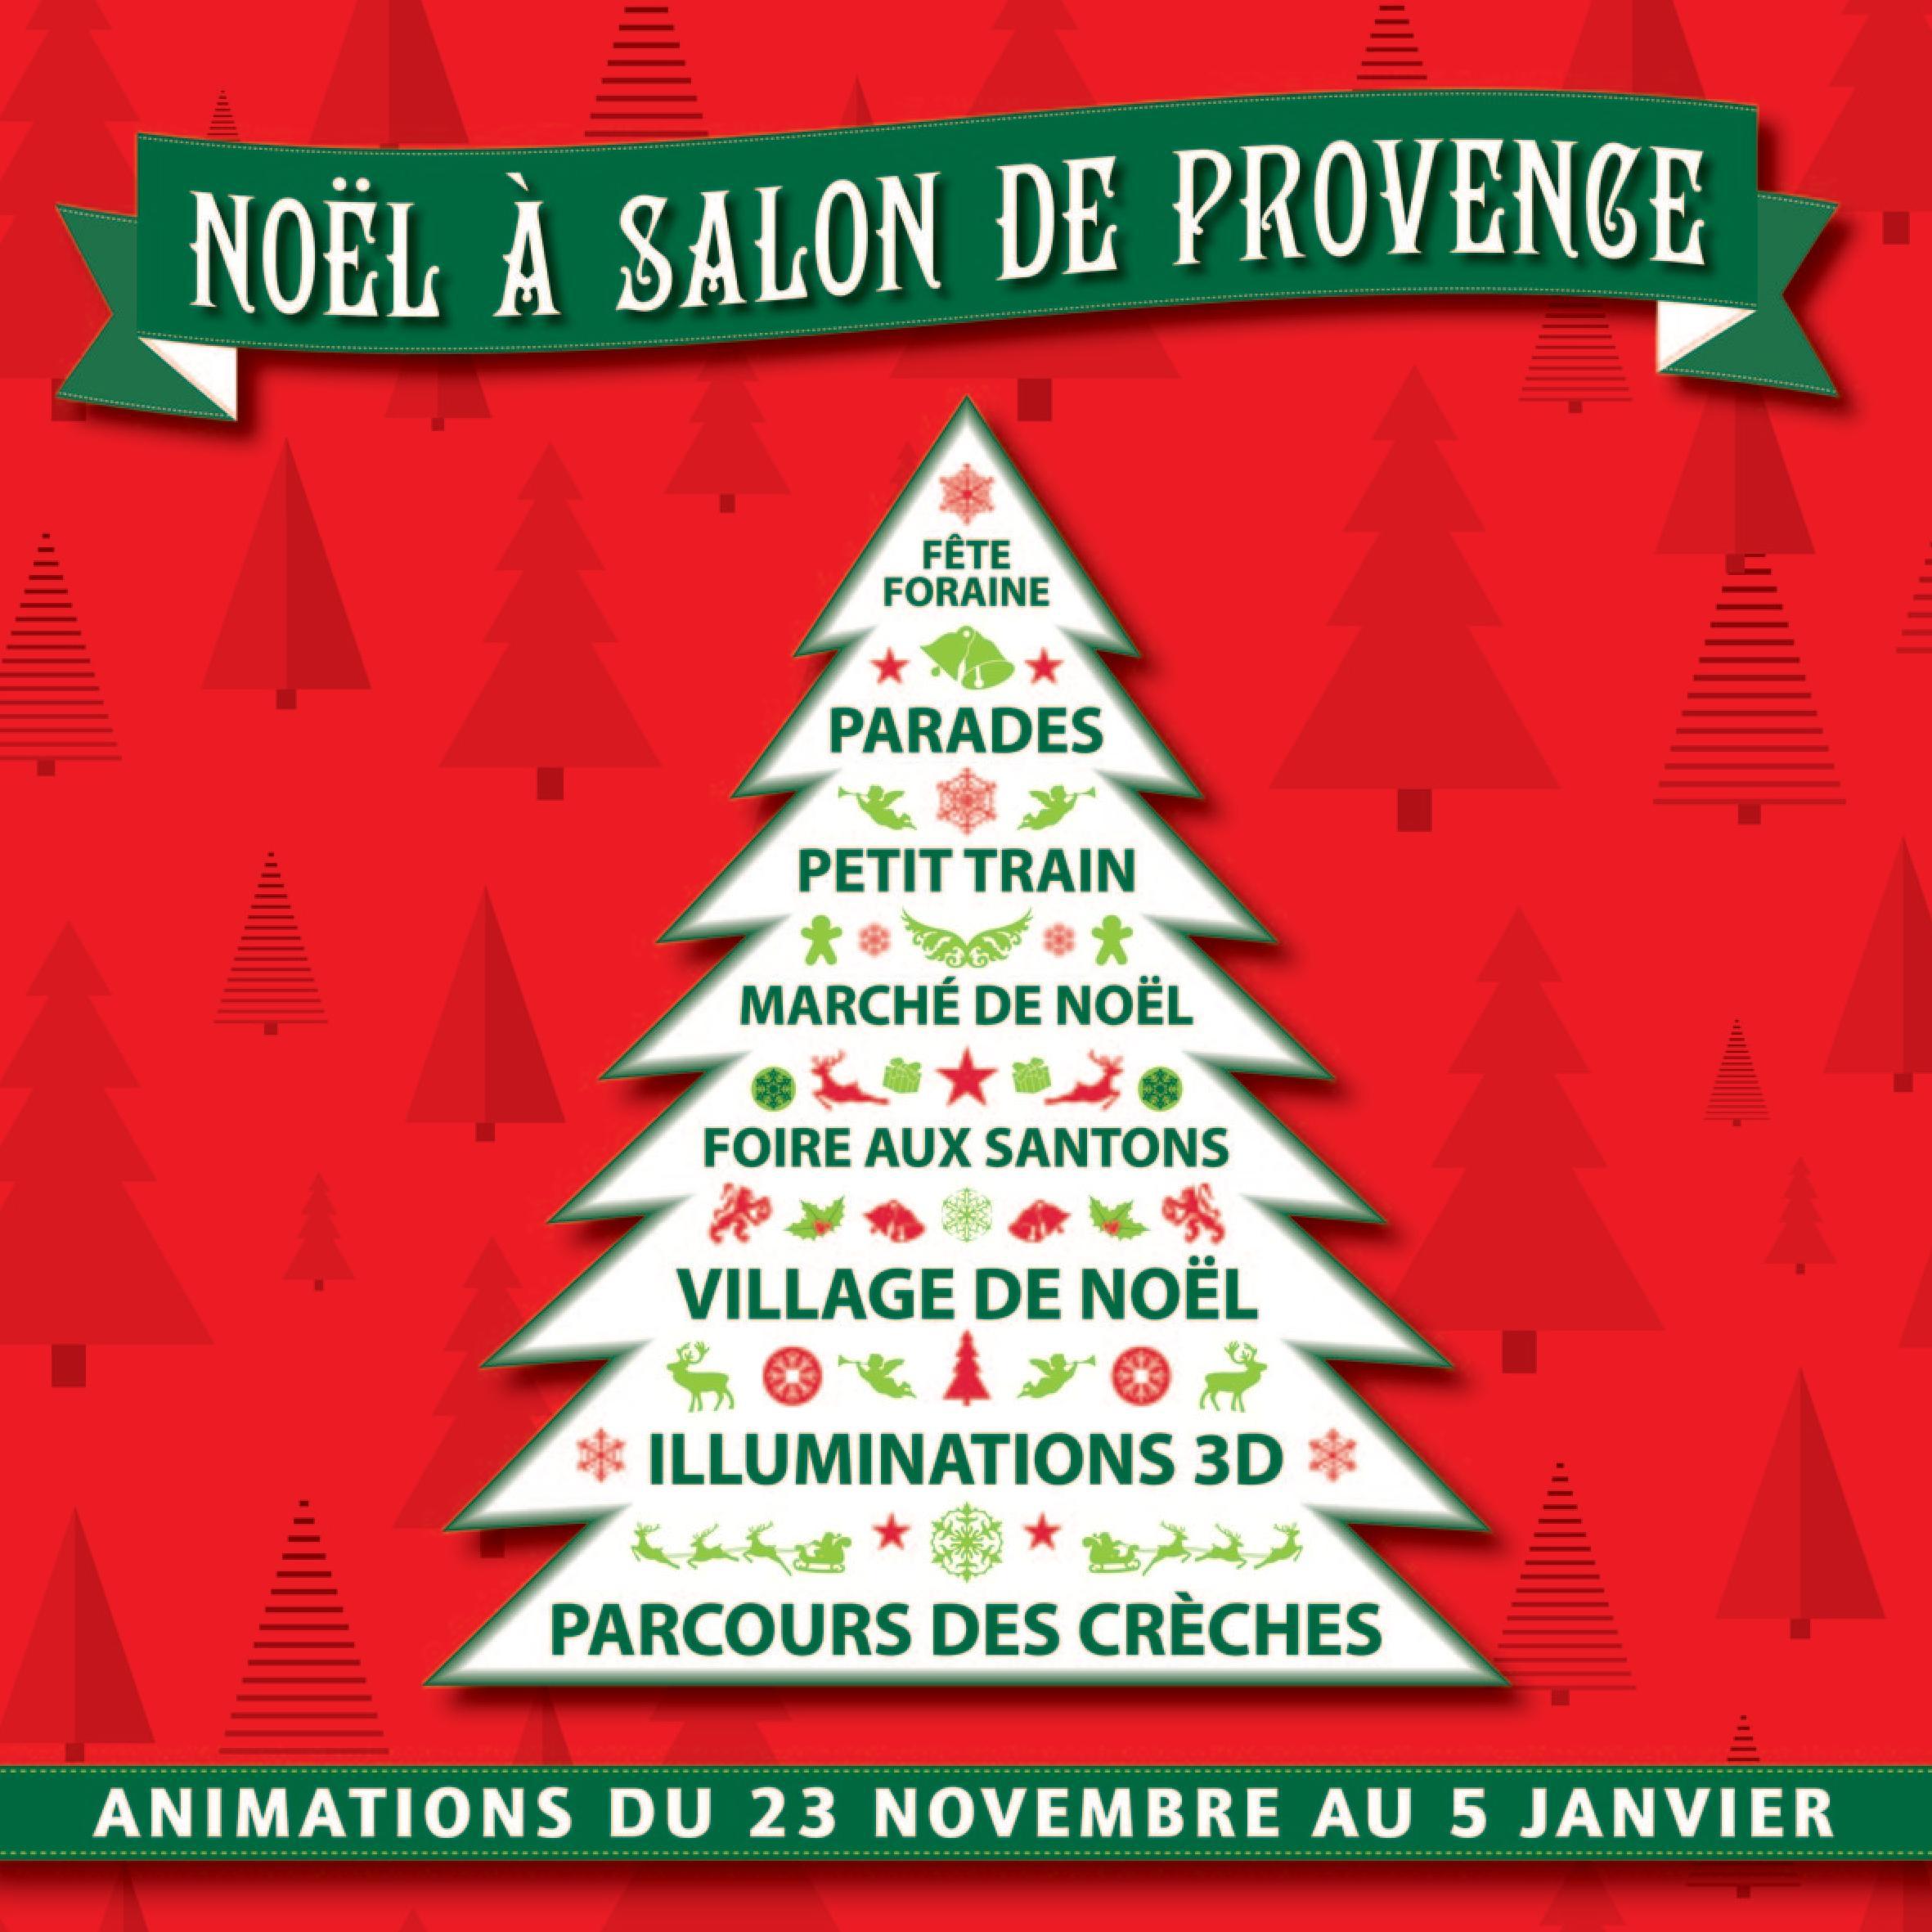 programme noel salon de provence (1)